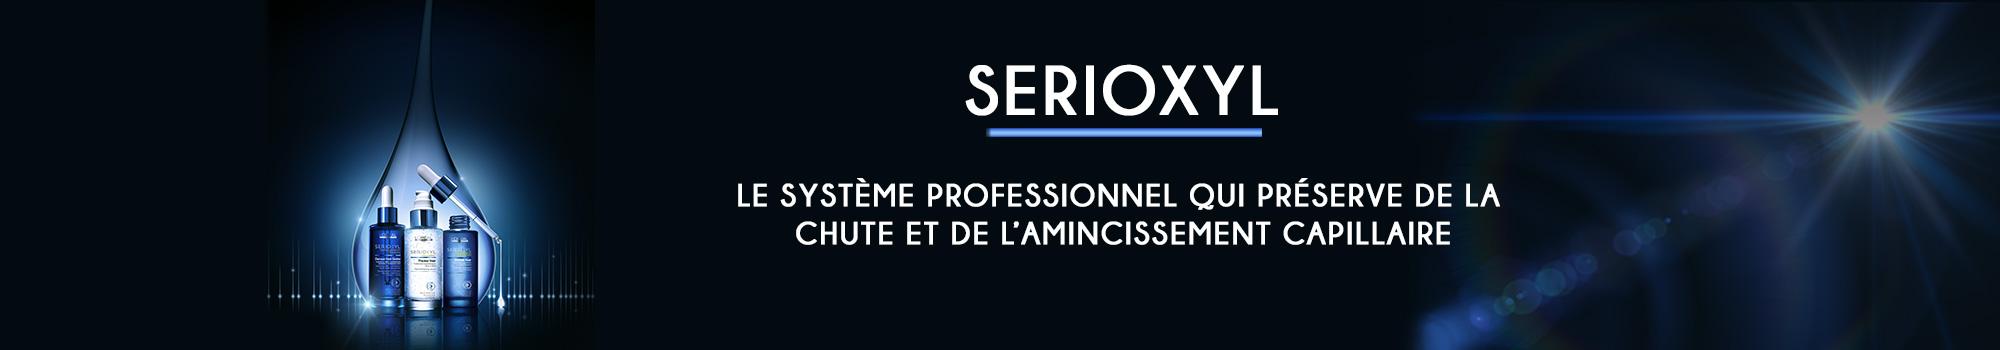 L'Oréal Professionnel Serioxyl